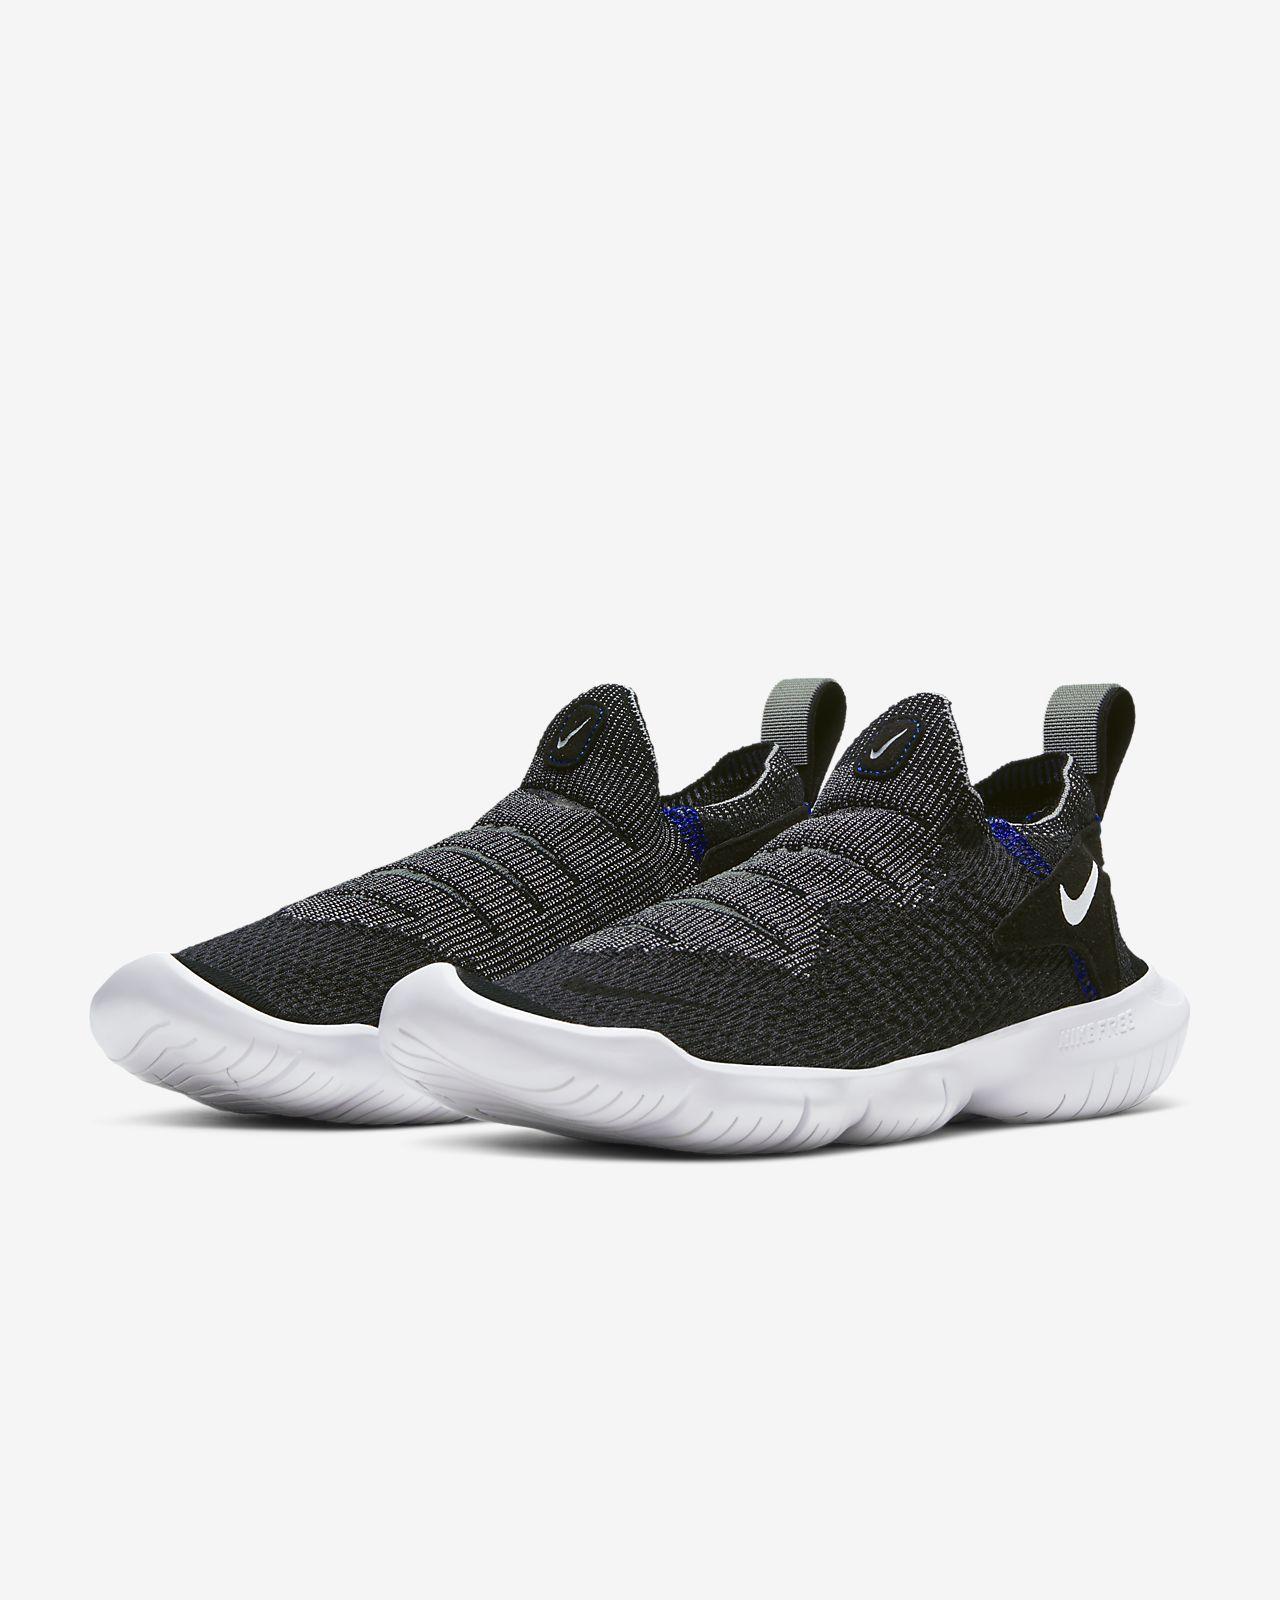 Nike Free RN Flyknit Nike Free RN Flyknit 3.0 2020 Women's Running Shoe. Nike IN